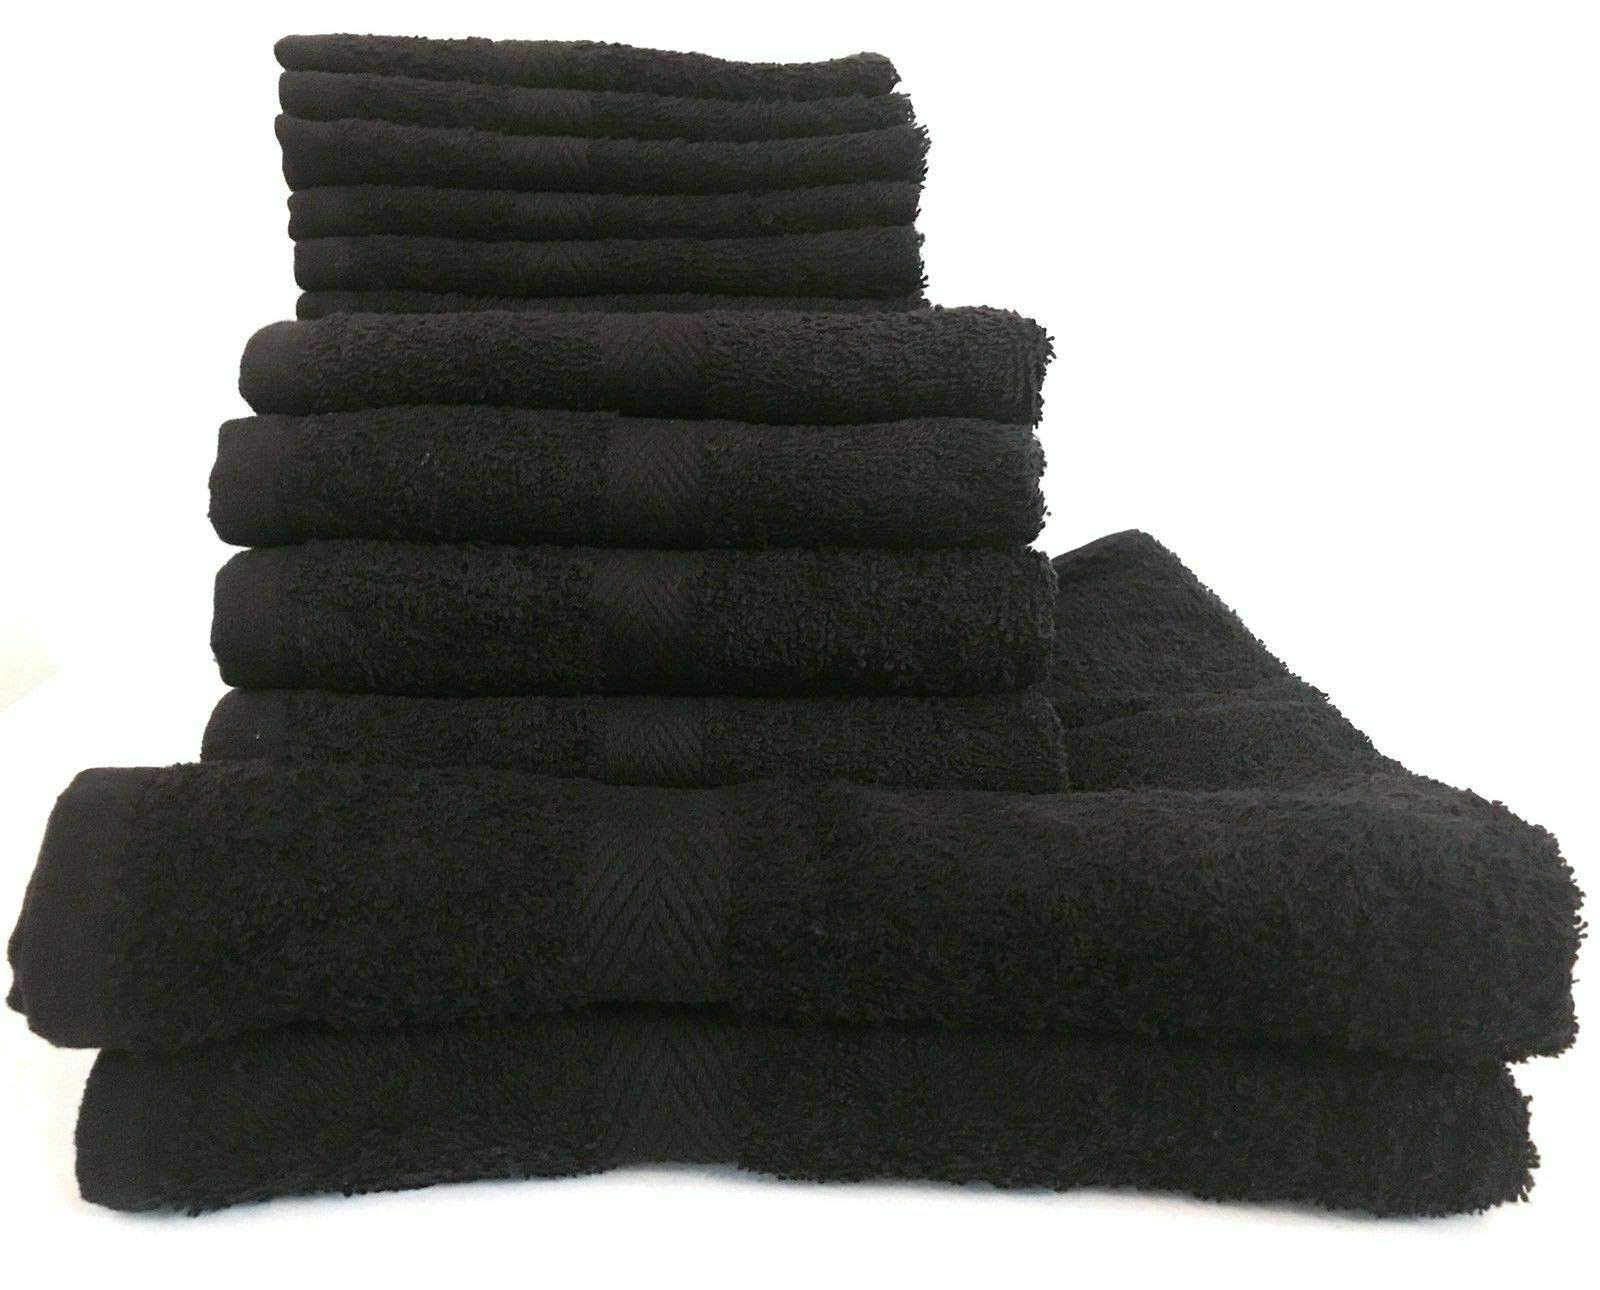 16x27'' Ring Spun 99% Cotton 24 Pack Black Salon Gym Heavy Hand Towels #GG11